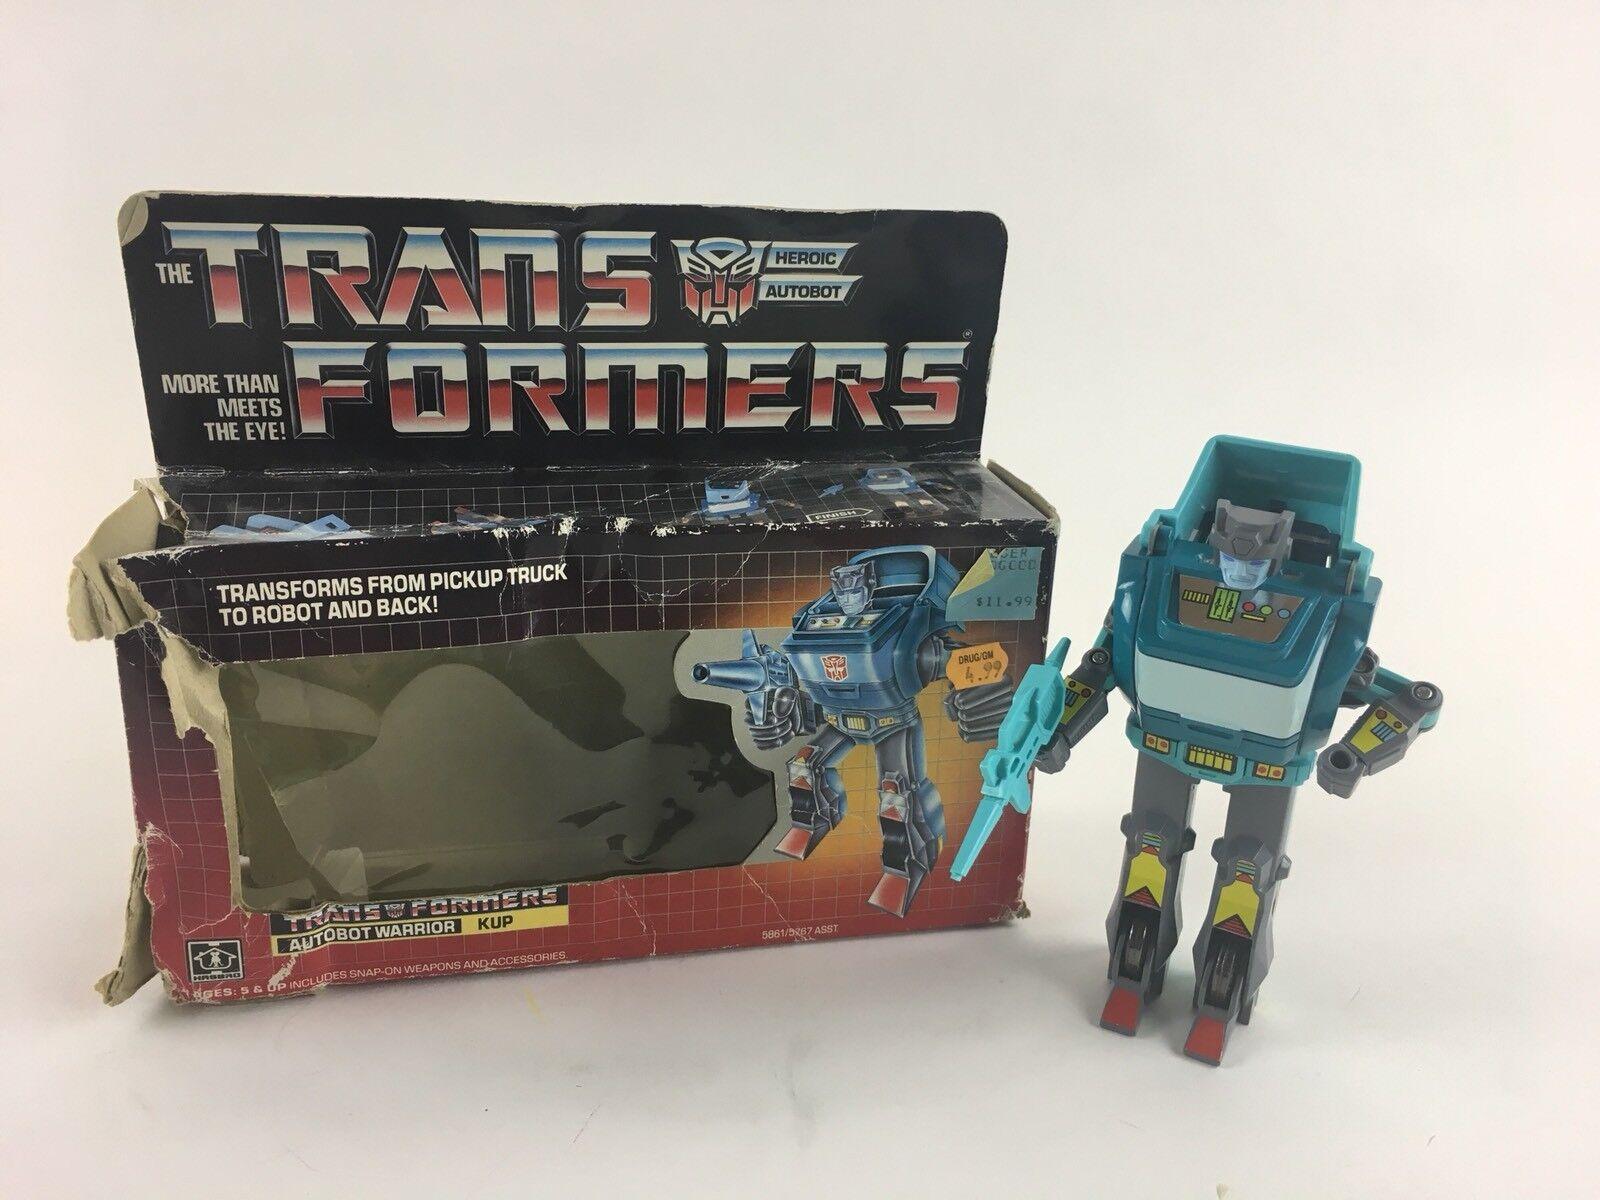 Vintage Original Transformers G1 Heroic Autobot Warrior KUP 1986 Hasbro with scatola